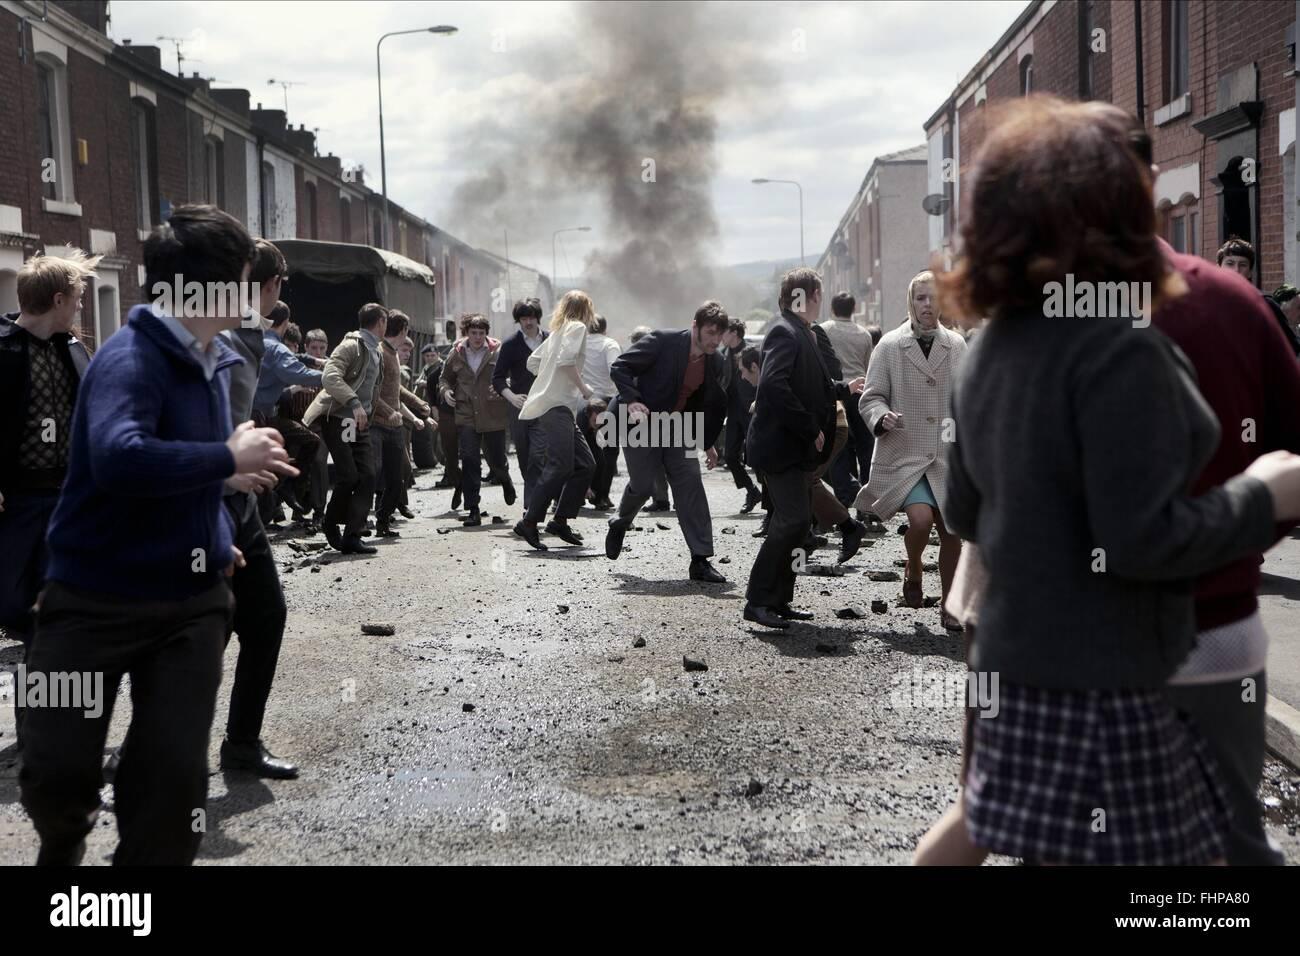 BELFAST CIVILIANS '71 (2014) - Stock Image